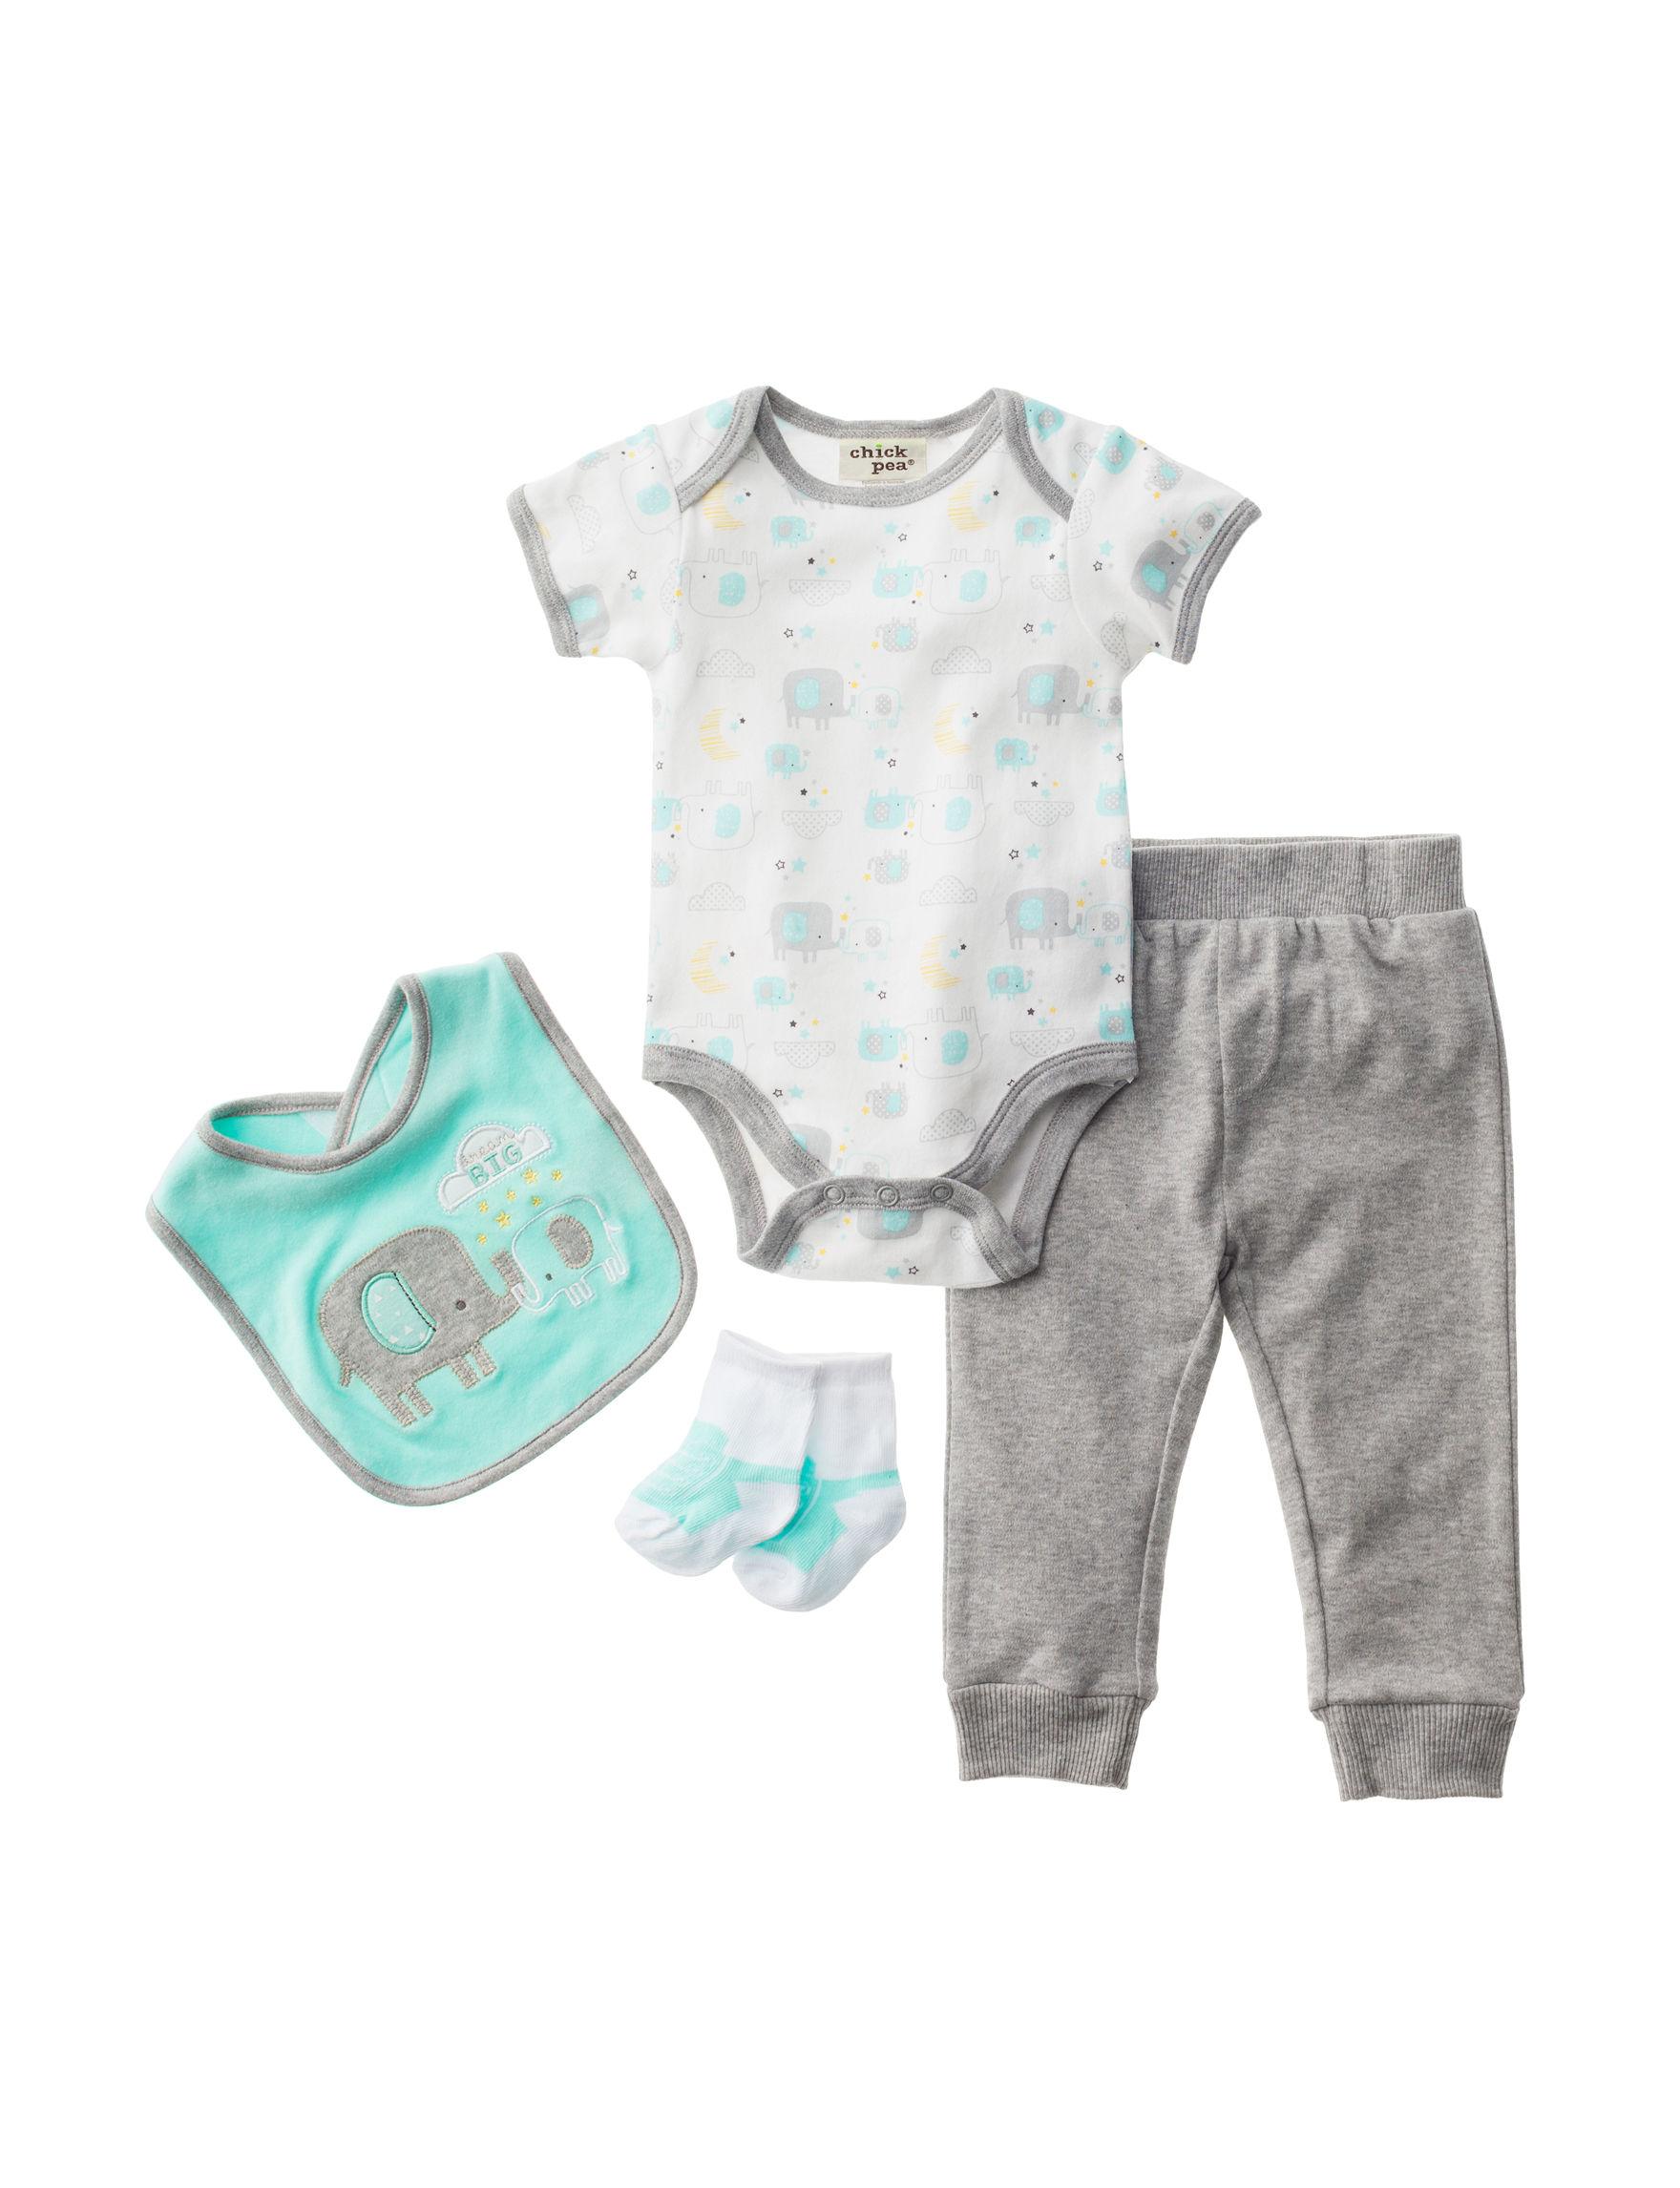 Baby Gear Heather Grey